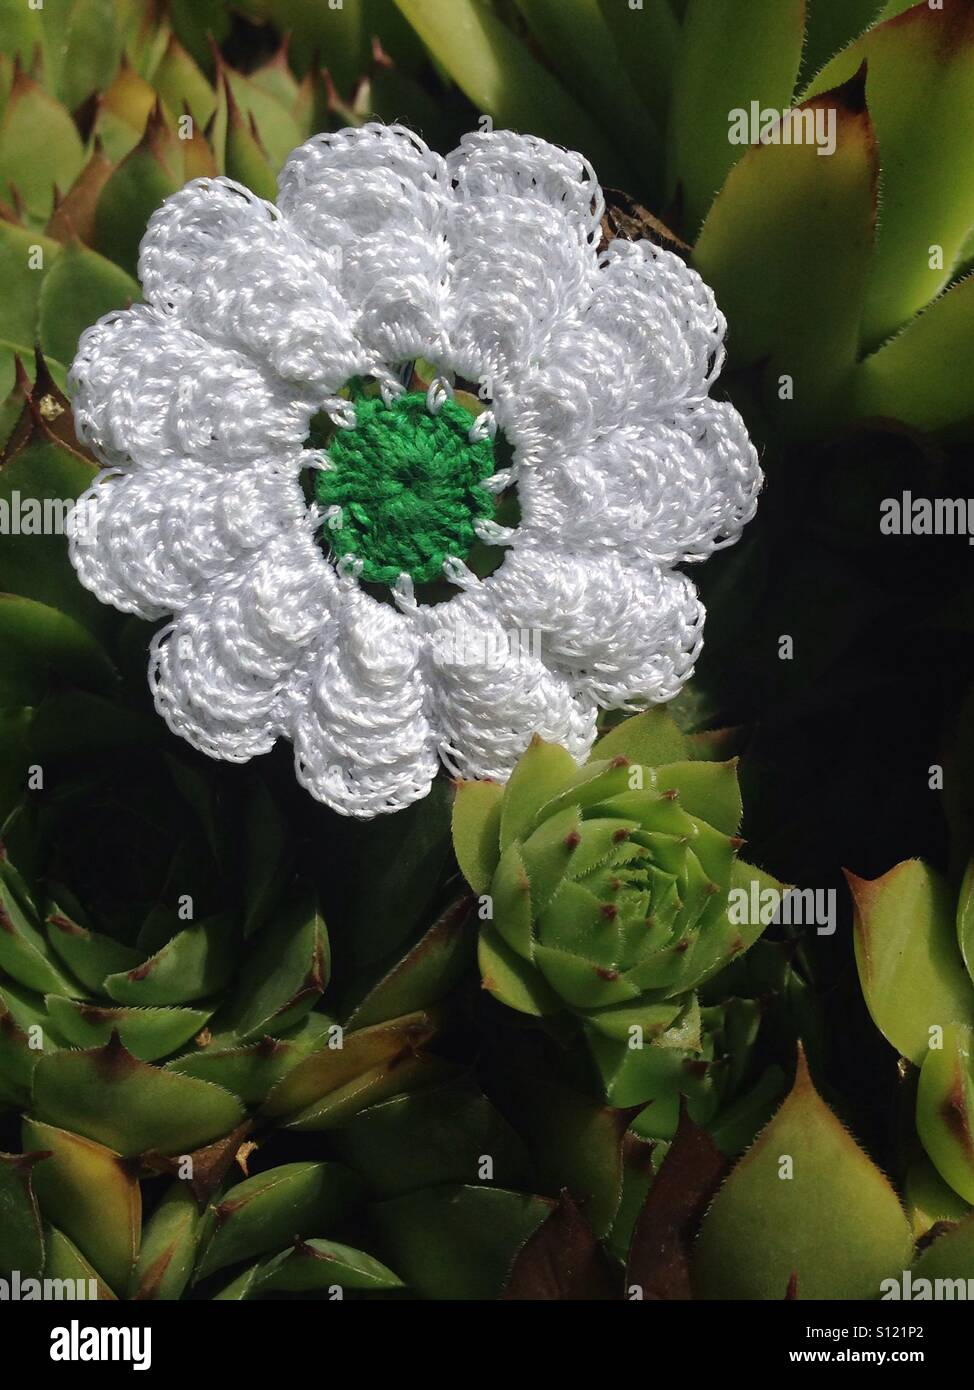 Srebrenica flower. Don't forget! - Stock Image